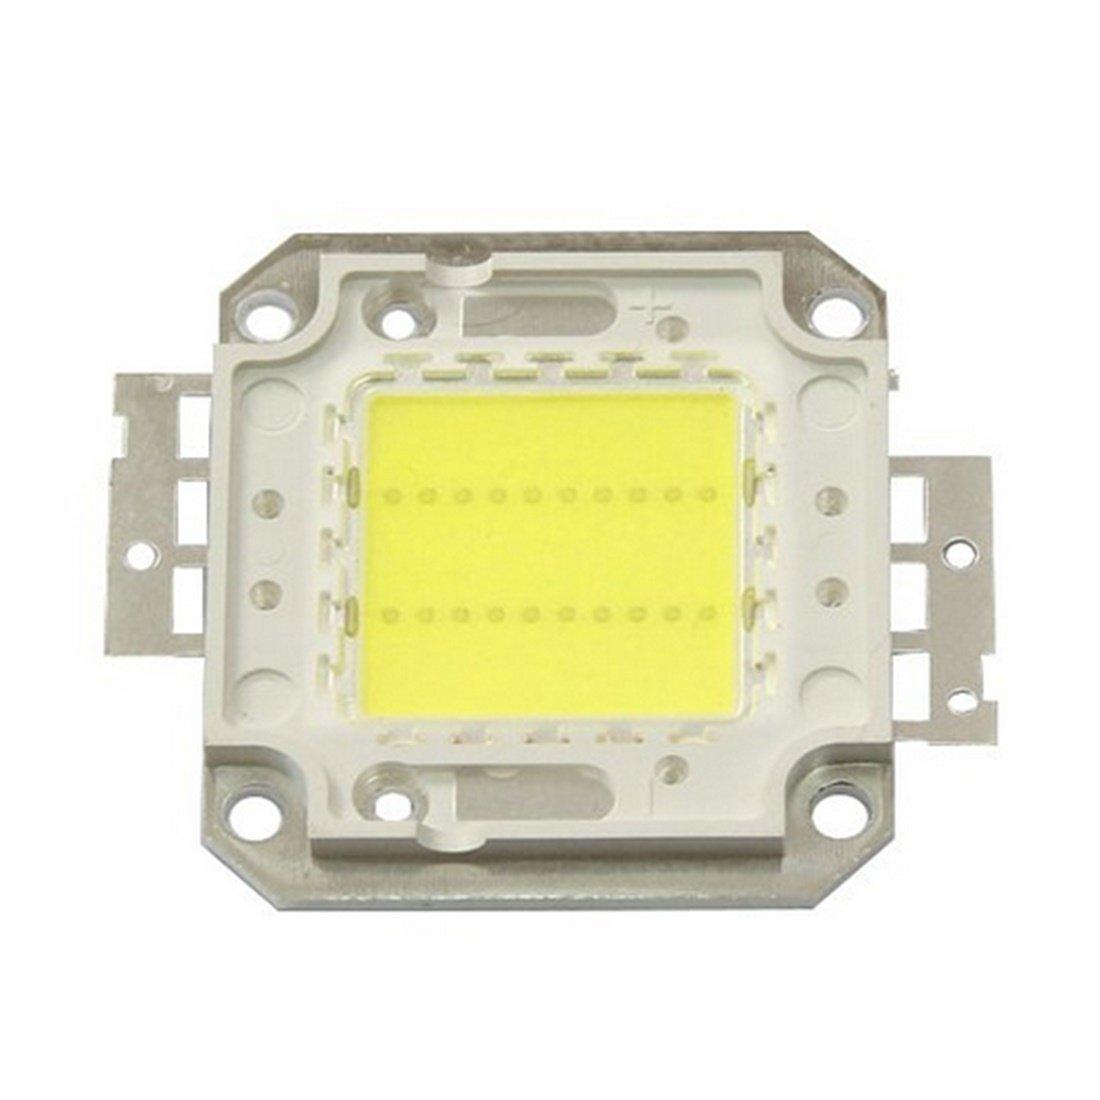 SRY-LED Bulbs High Power LED Chip Beads COB Beads 20W 30W 50W 70W 100W 3000K/6000K For Floodlight Spotlight Energy saving (Color : Warm white, Wattage : 20W)